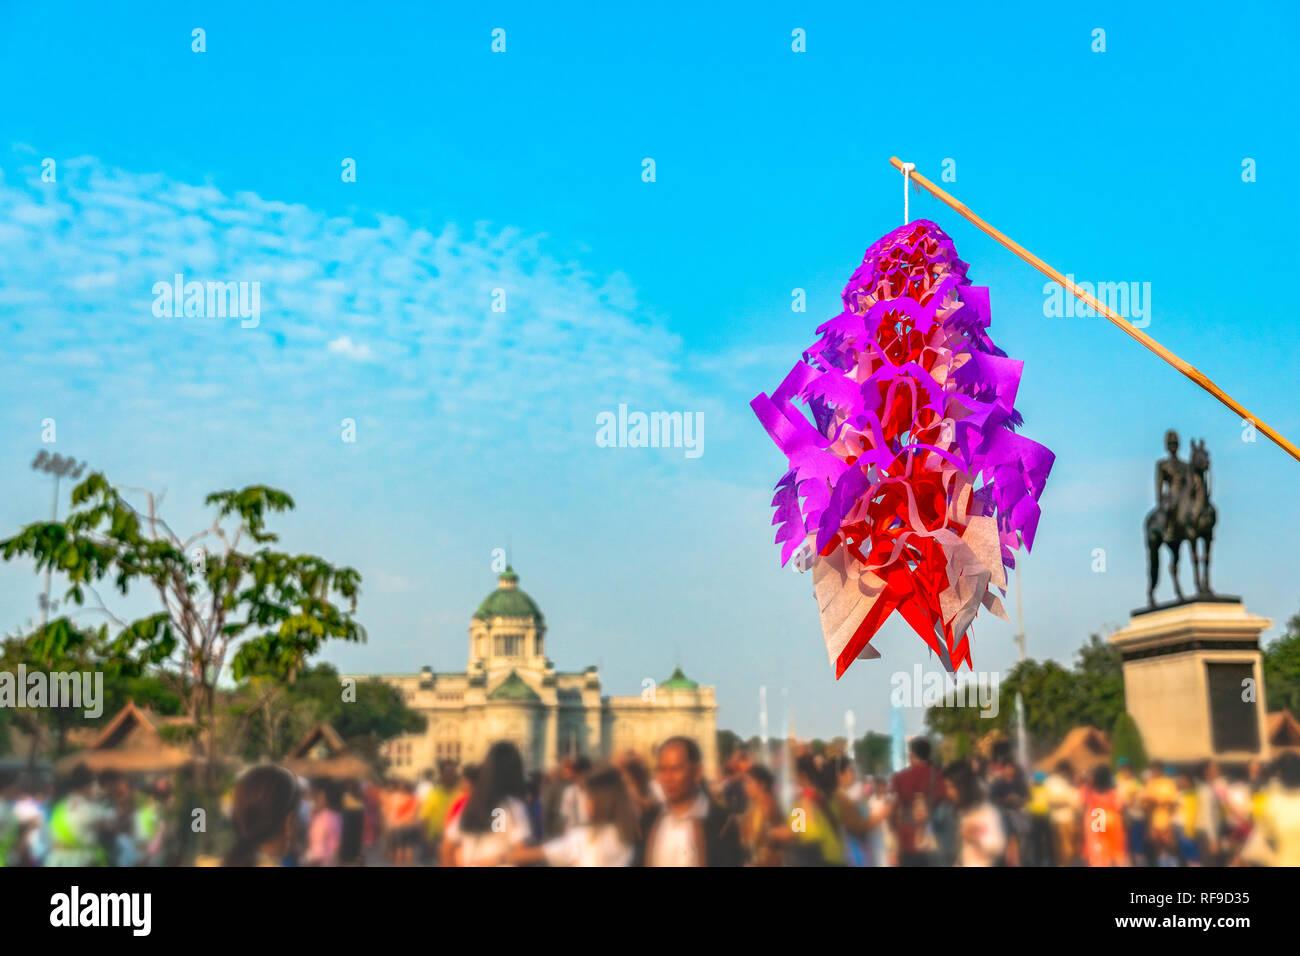 Bunte fliegende Papier Modell tradition Thai handgefertigt in der Pferdesport Innenhof Un-Ki Rak Khlai Khwam Nao-Festival in Bangkok. Stockbild